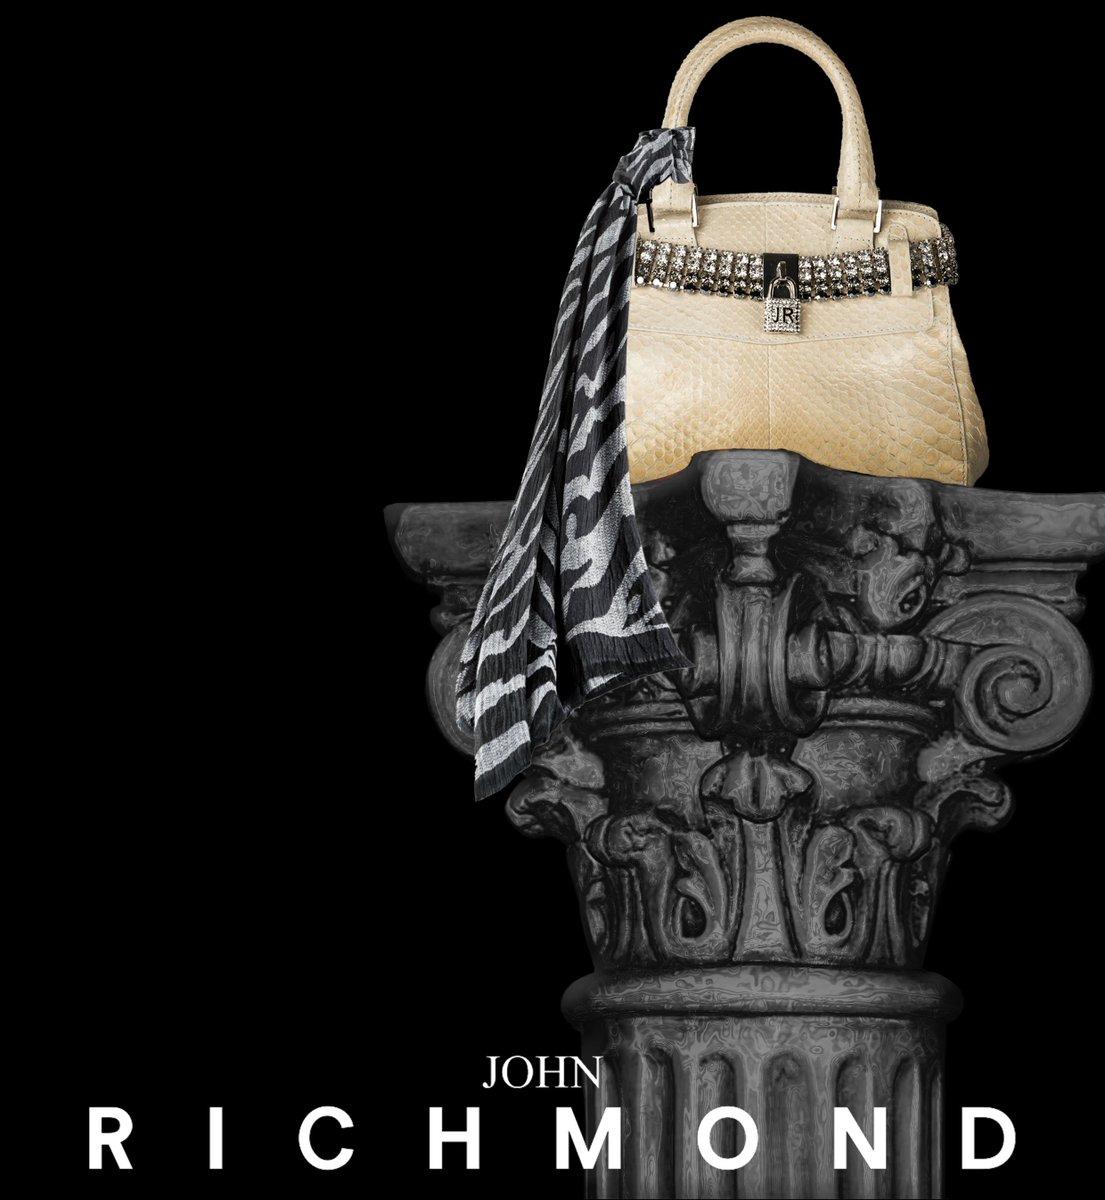 #johnrichmondofficial #bag #scarf #fw1516 #fashion https://t.co/Lic23KytHt